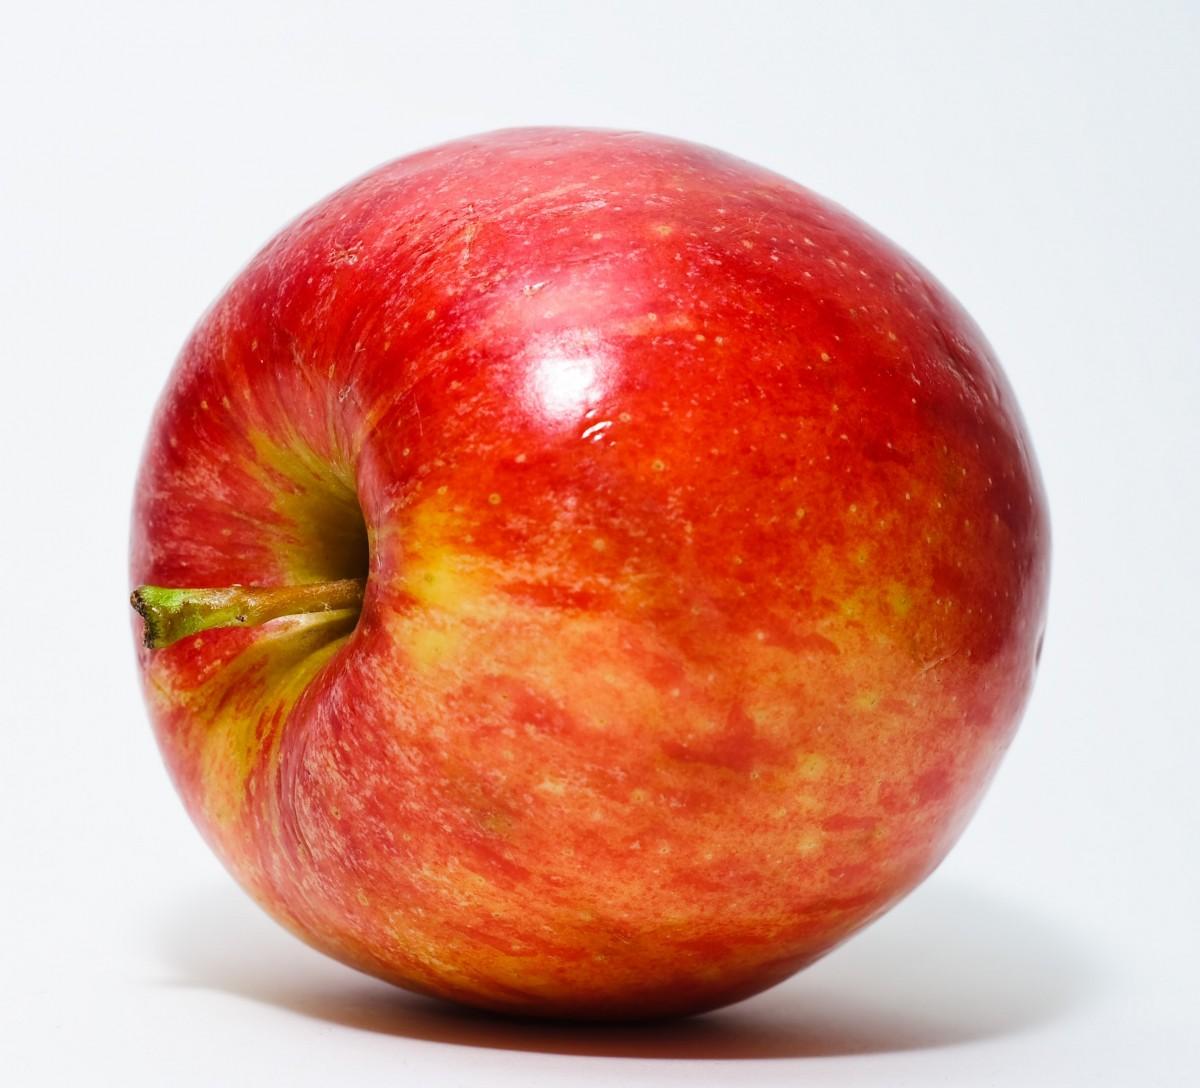 apple inversion